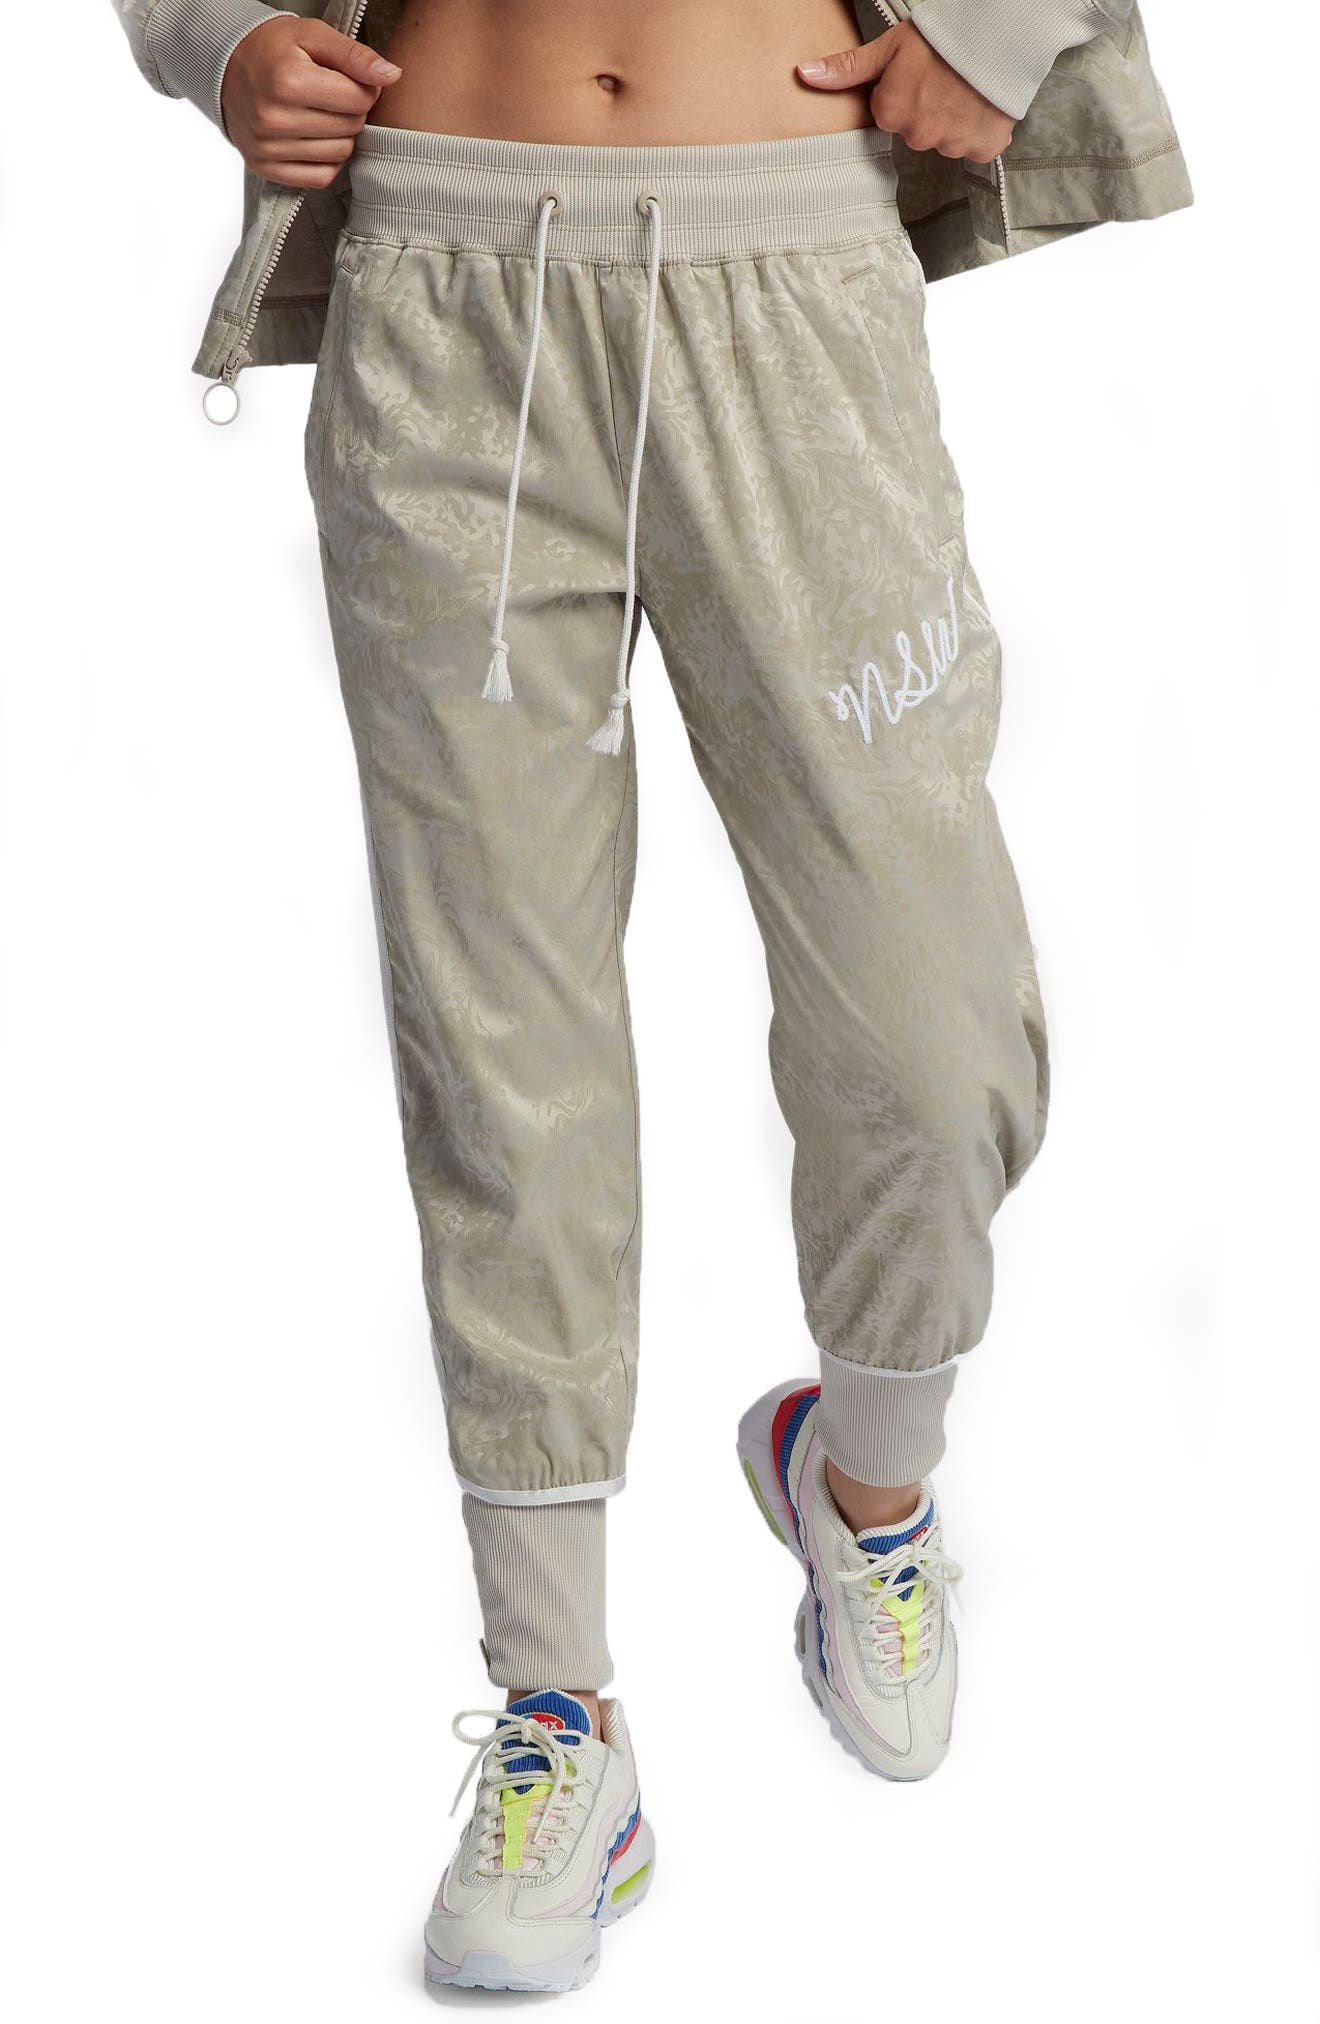 Sportswear NSW Women's Track Pants,                             Alternate thumbnail 2, color,                             201